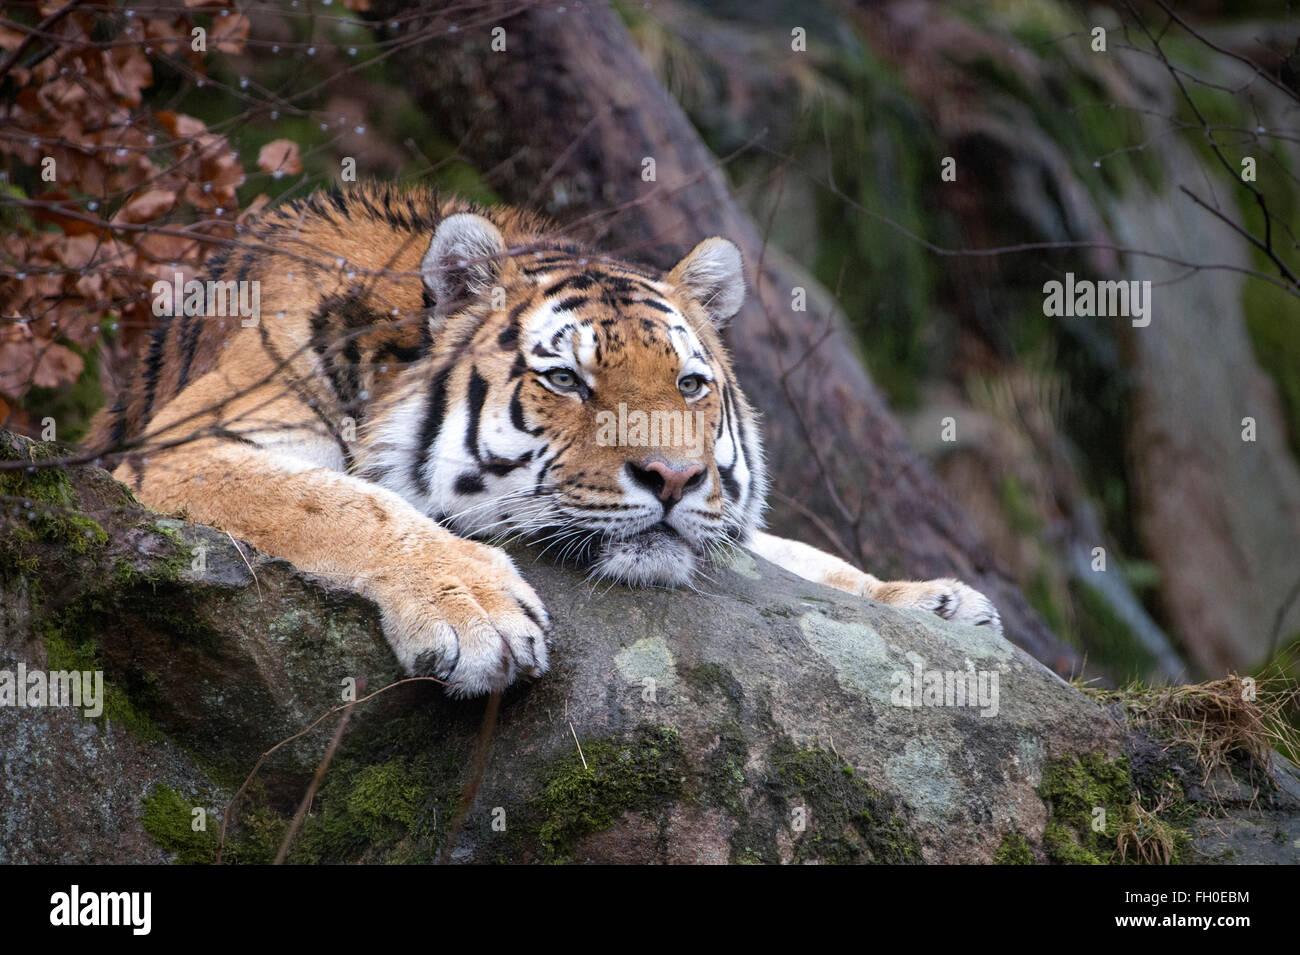 Male Amur (Siberian) tiger lying on rock, looking bored - Stock Image